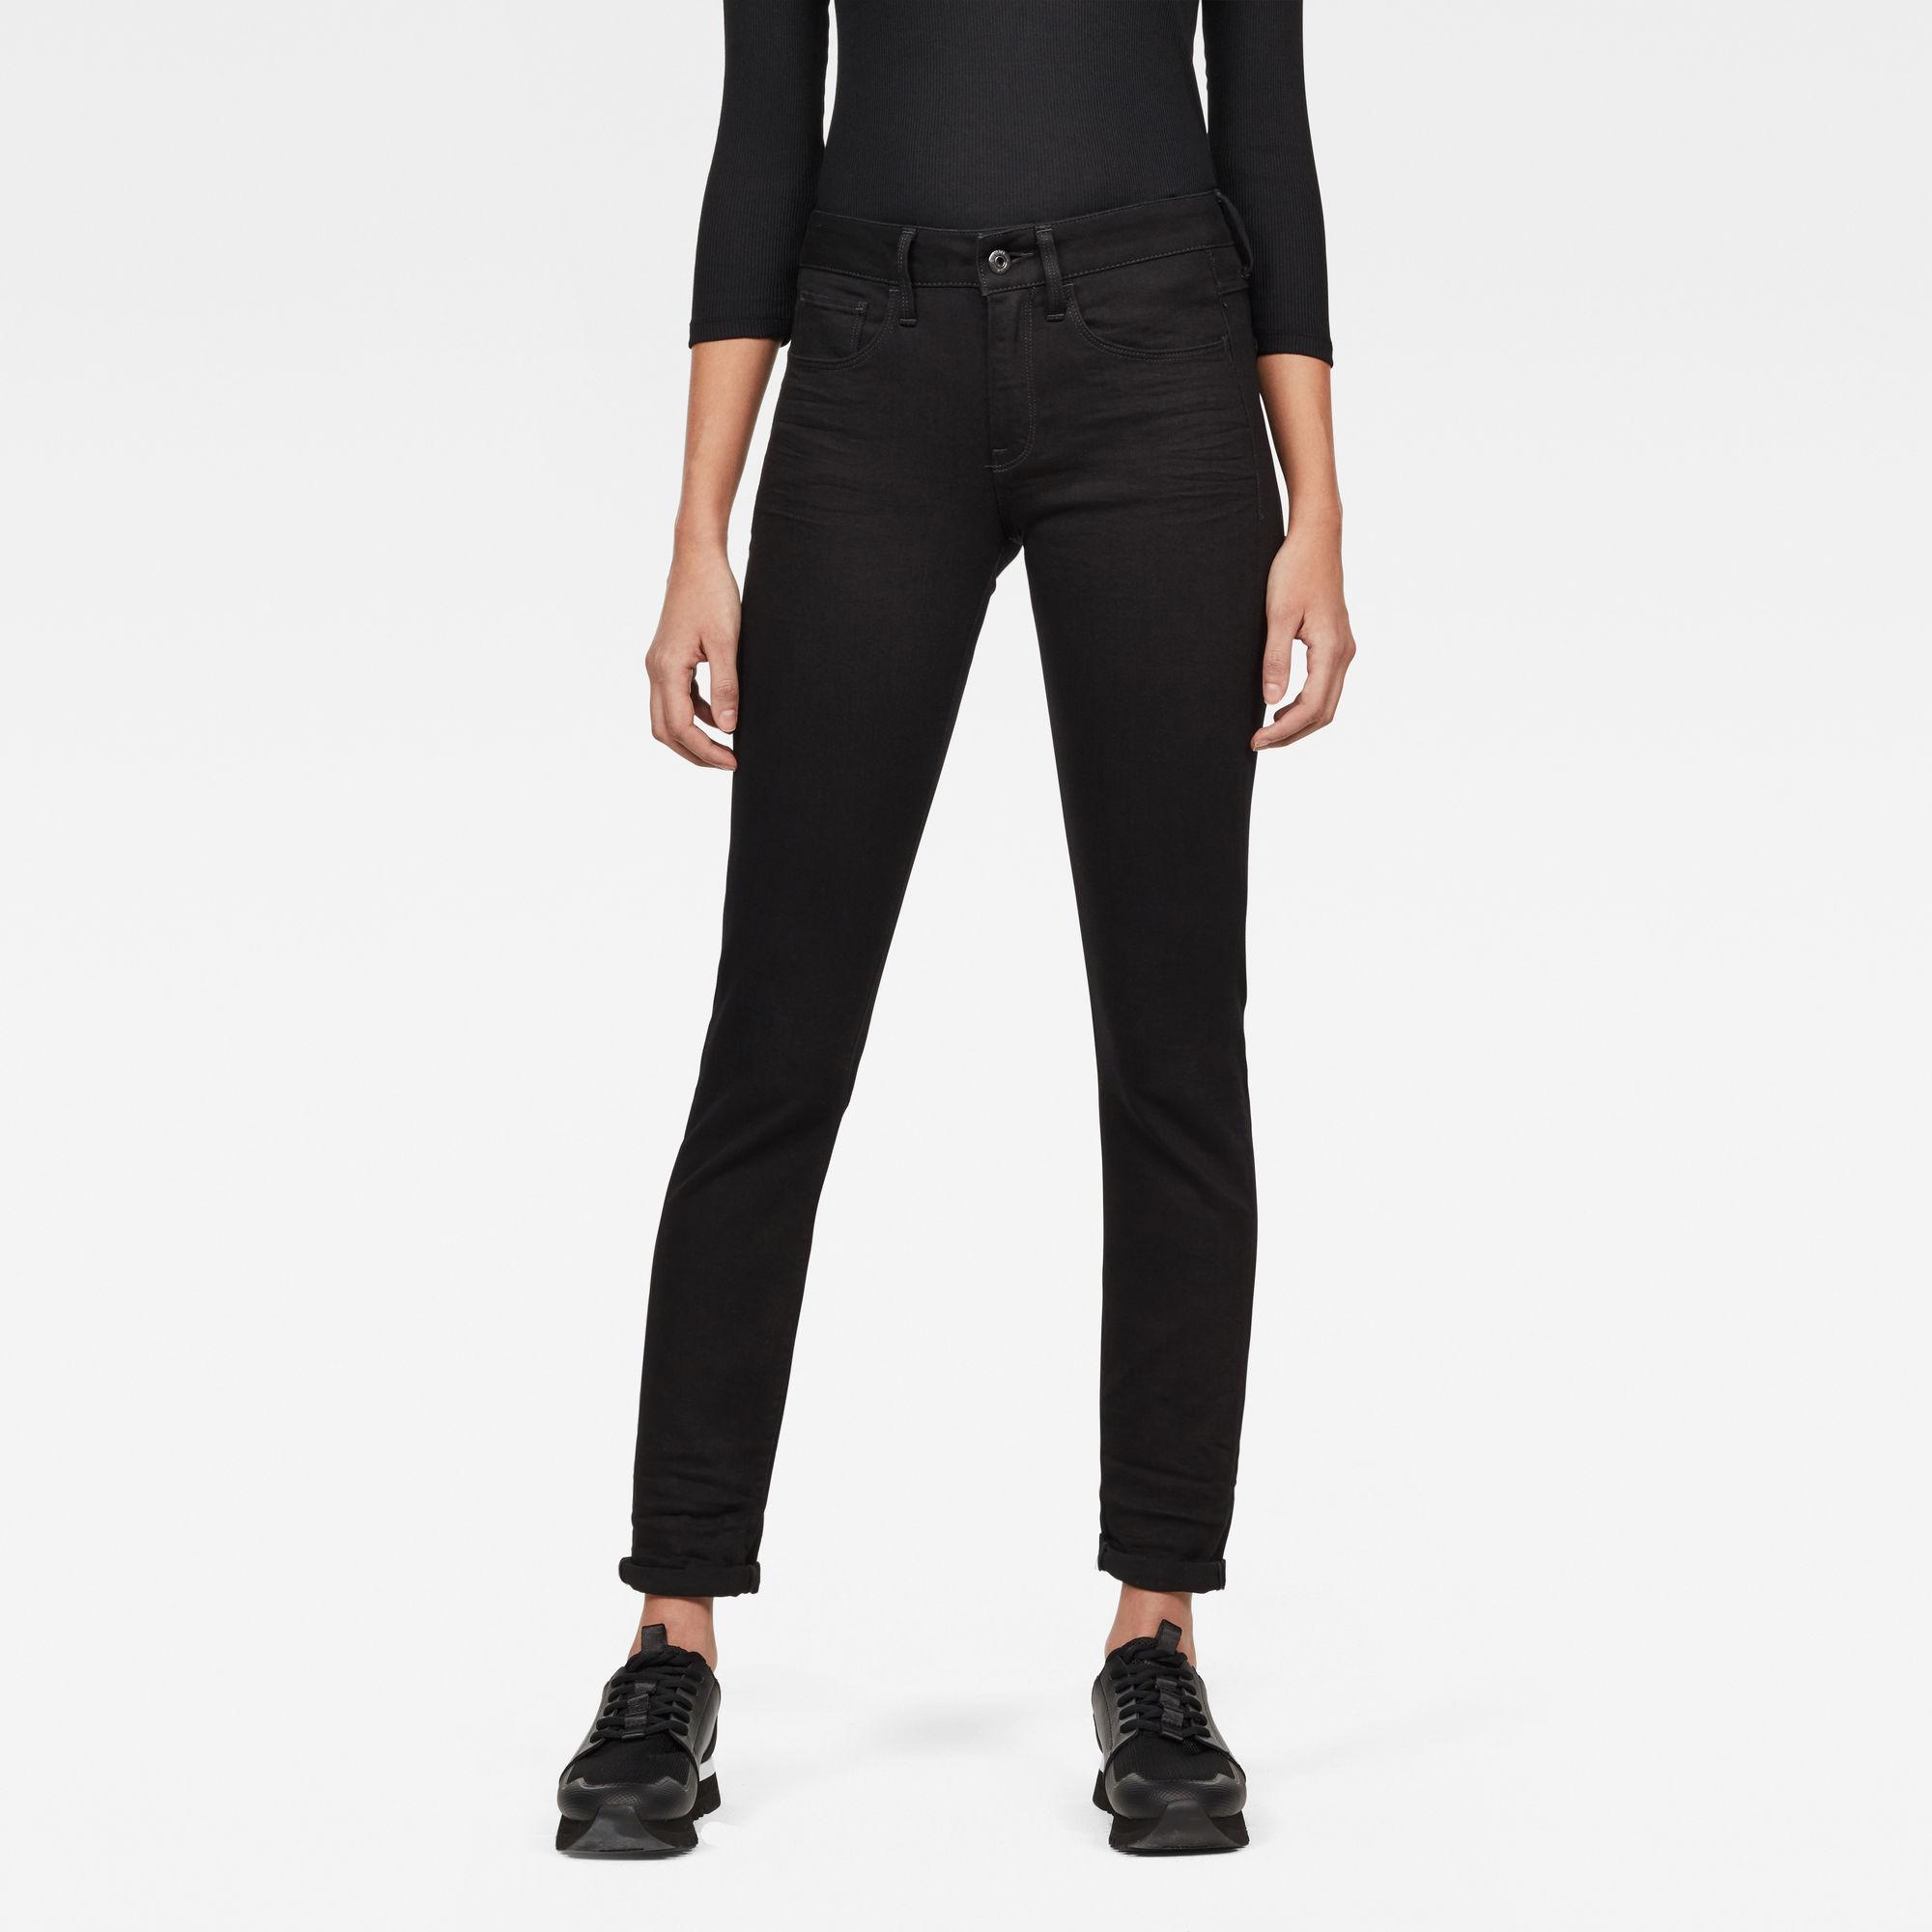 Imagem de 3301 Deconstructed Mid-Waist Straight Jeans